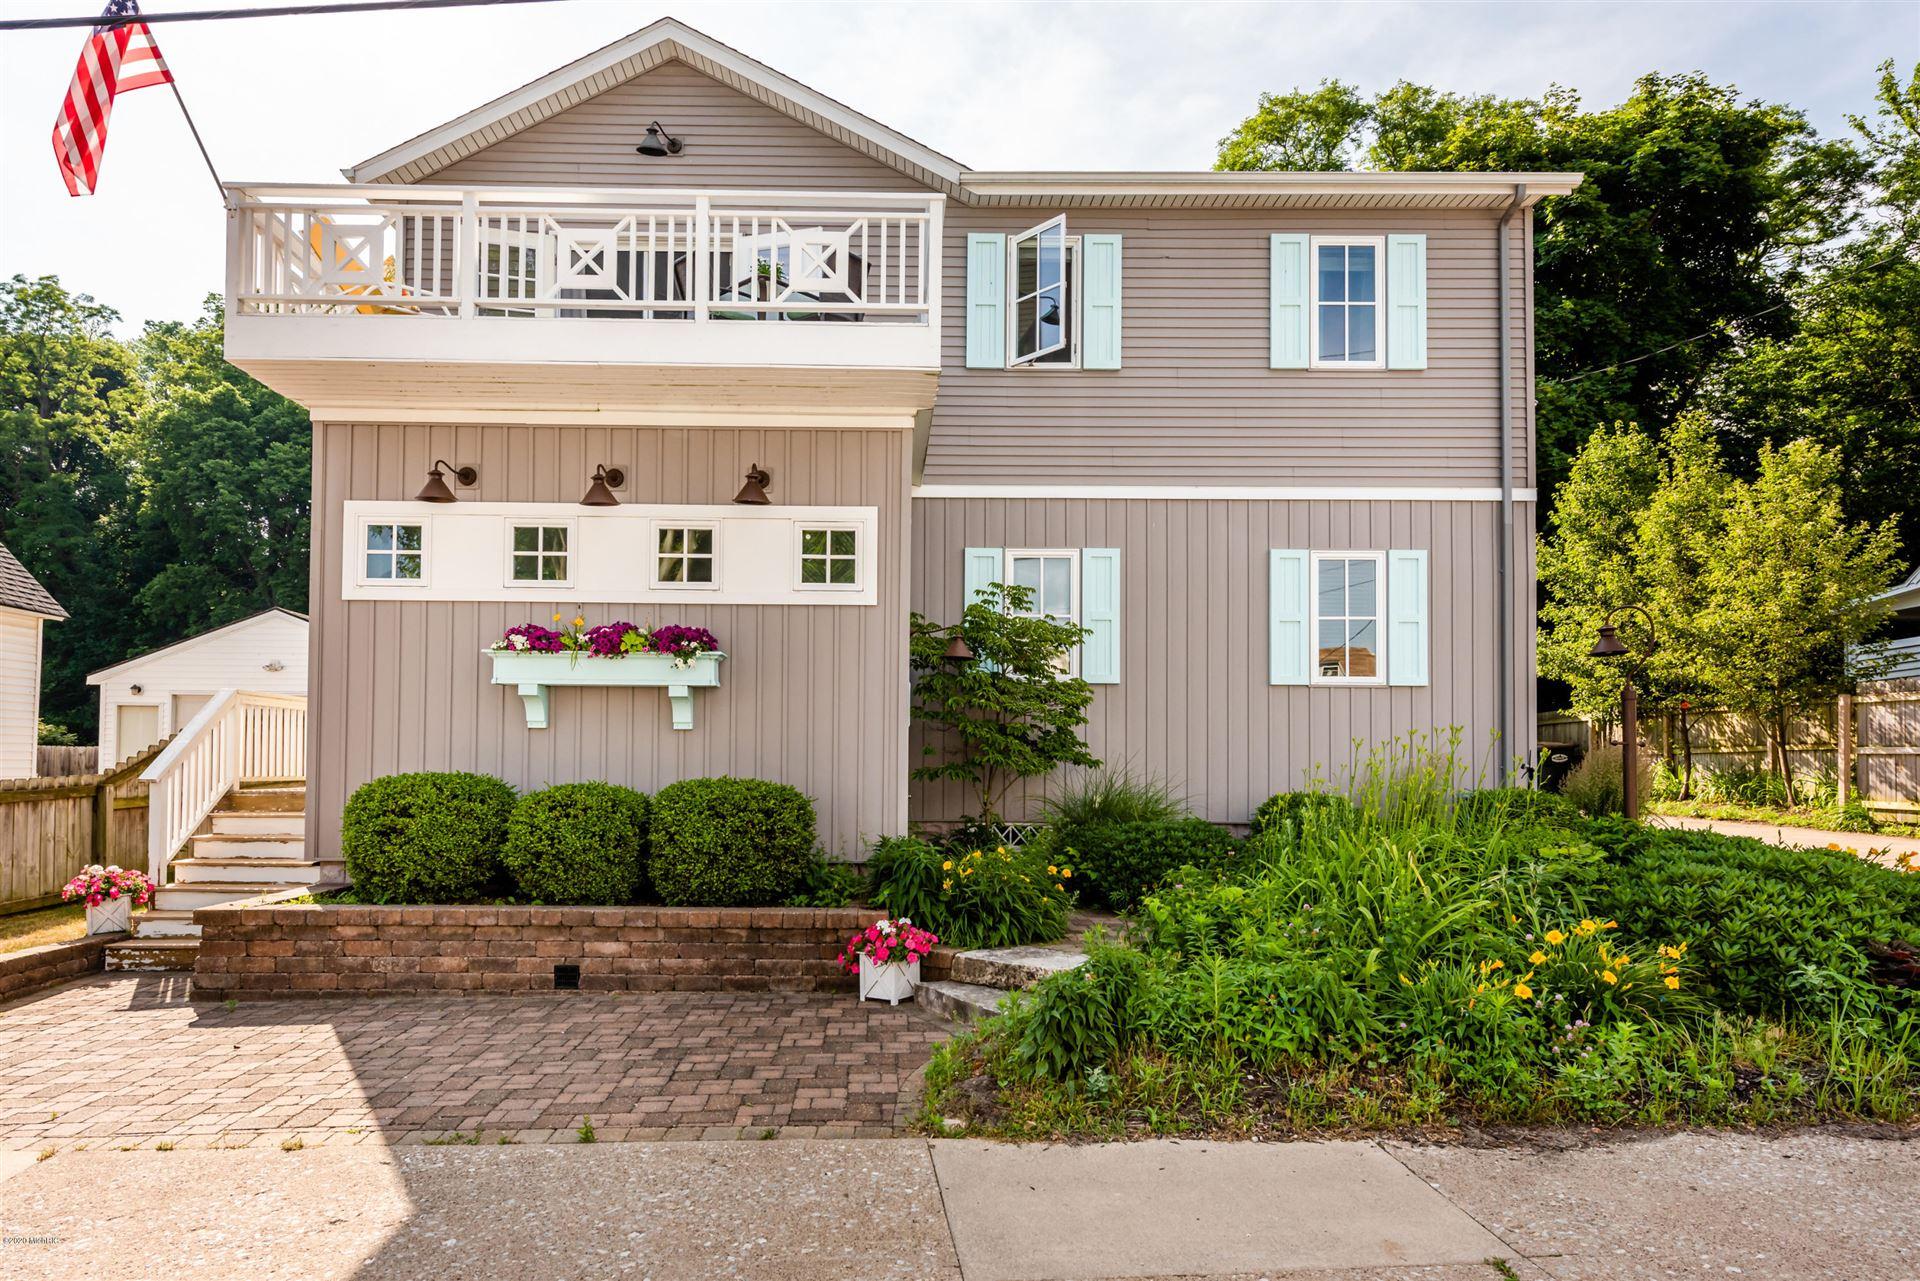 724 Vine Street, Saint Joseph, MI 49085 - MLS#: 20023556